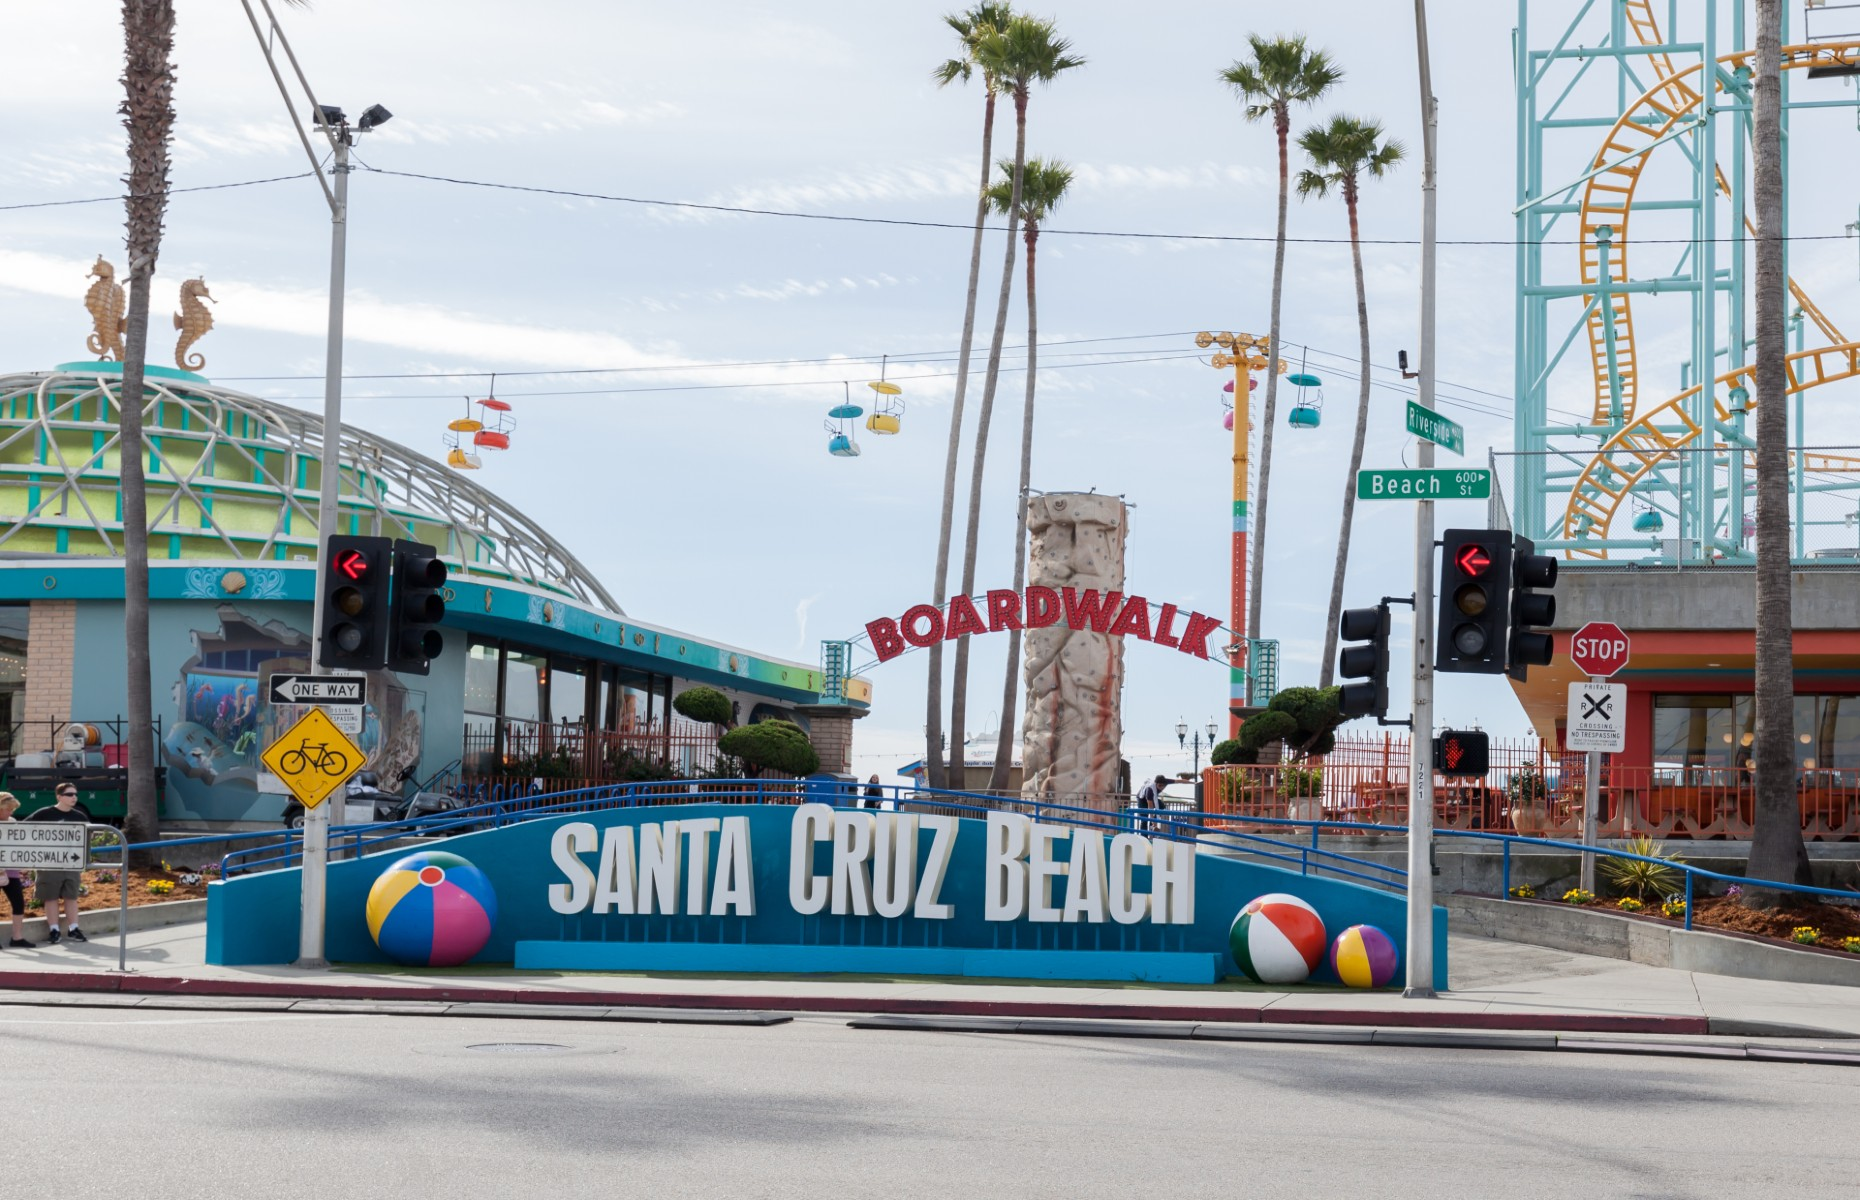 Santa Cruz Beach Boardwalk showing big wheel and rides (Image: JHVEPhoto/Shutterstock)